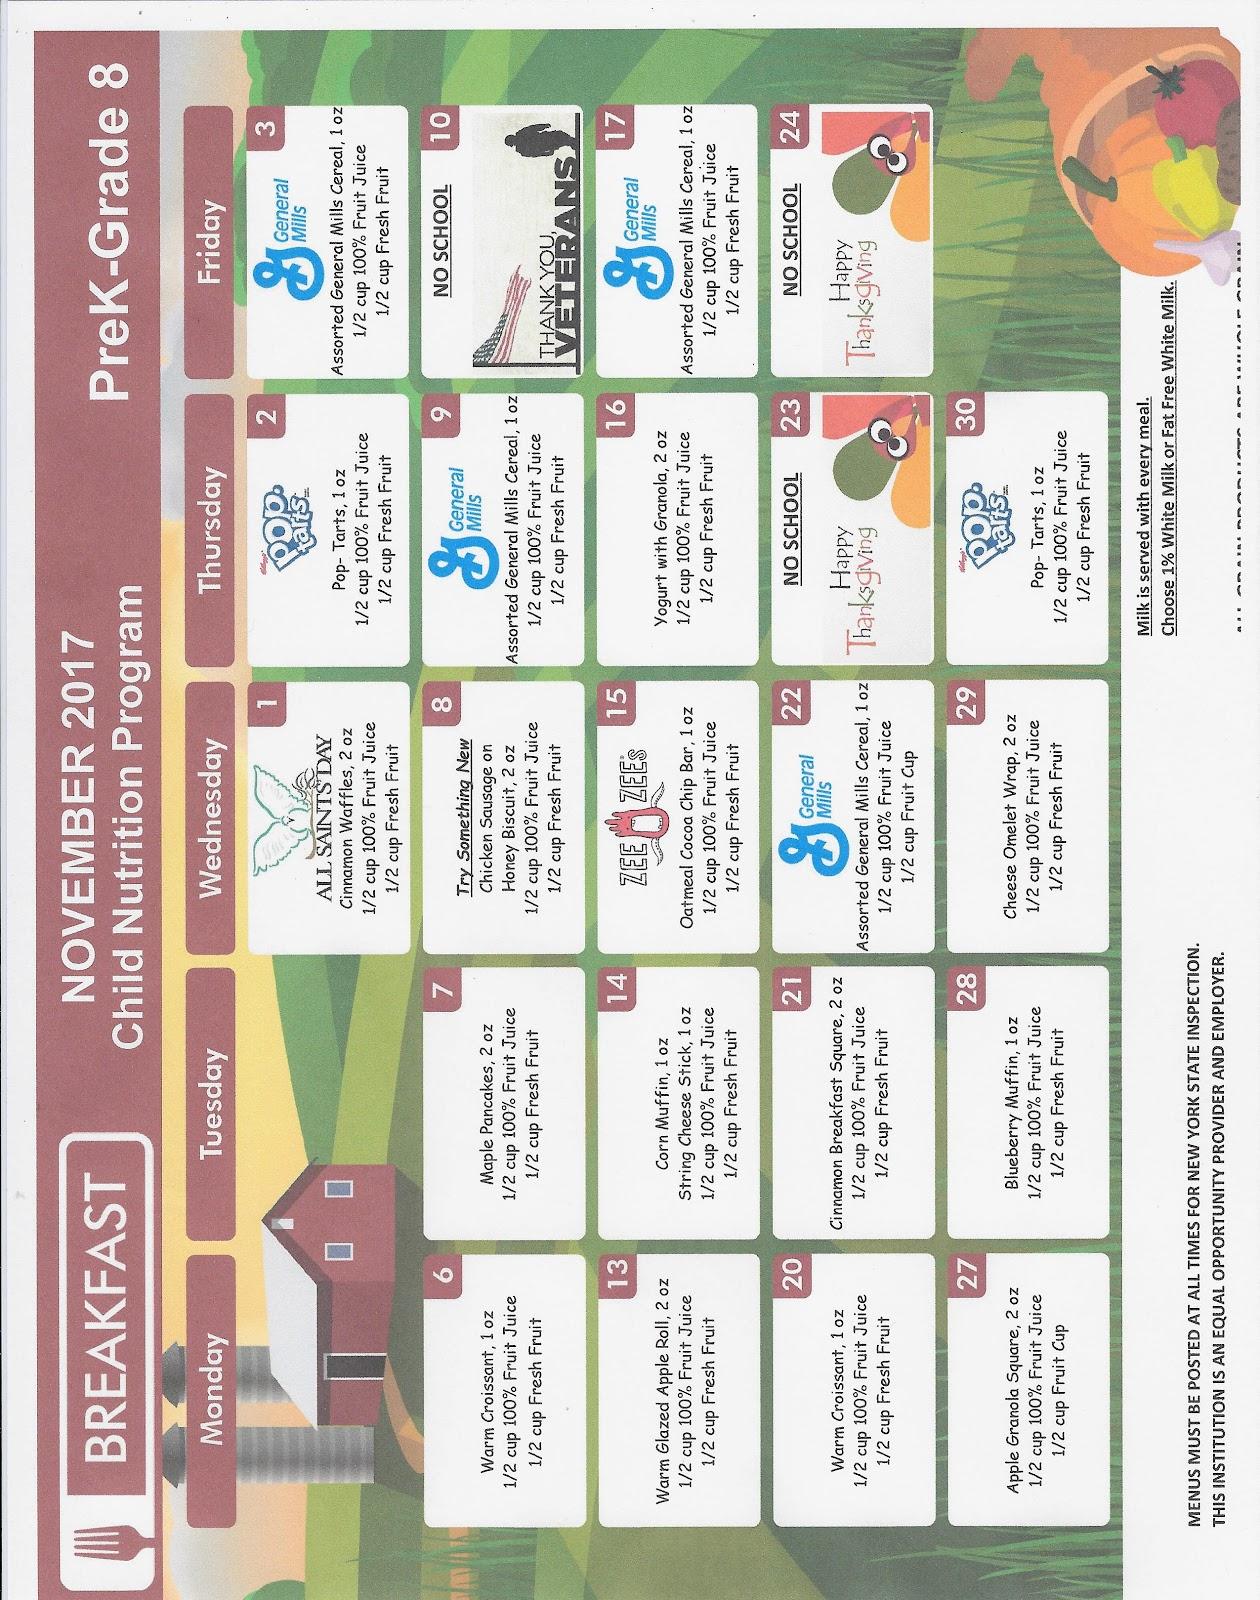 Nov 17 menu.jpg